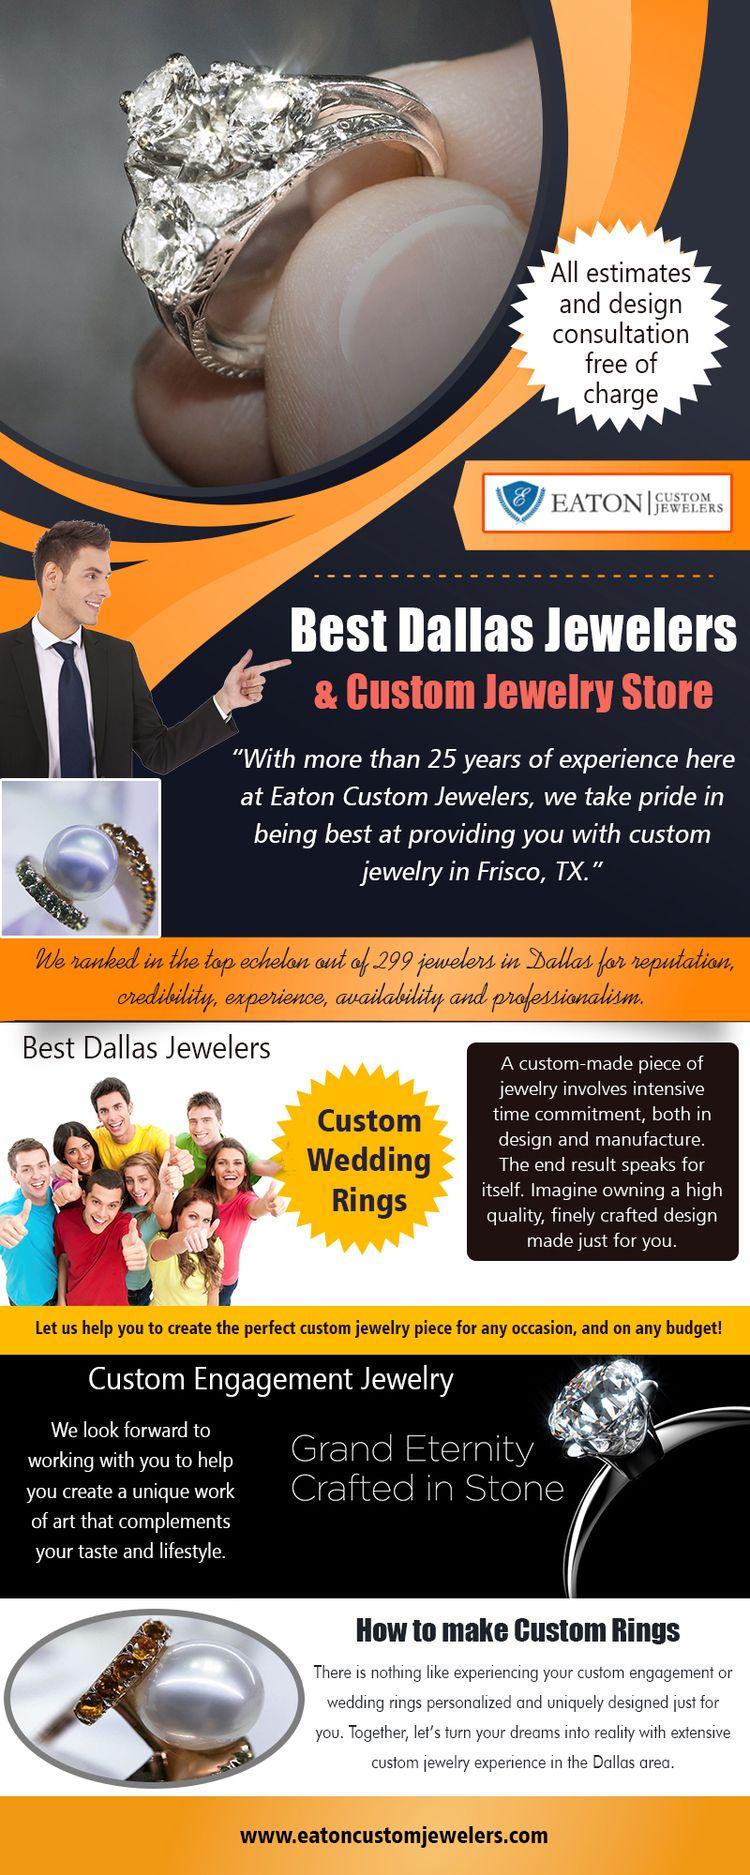 Dallas Jewelers Custom Jewelry  - dallasjewelers | ello